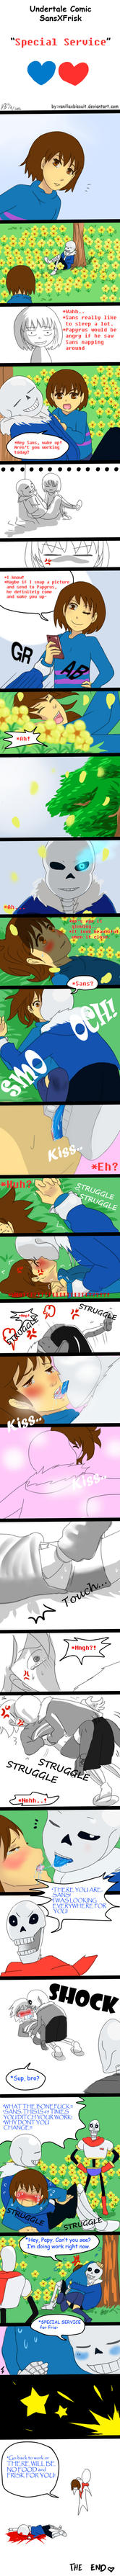 Undertale Comic SansxFrisk: SPECIAL SERVICE by vanillaxbiscuit